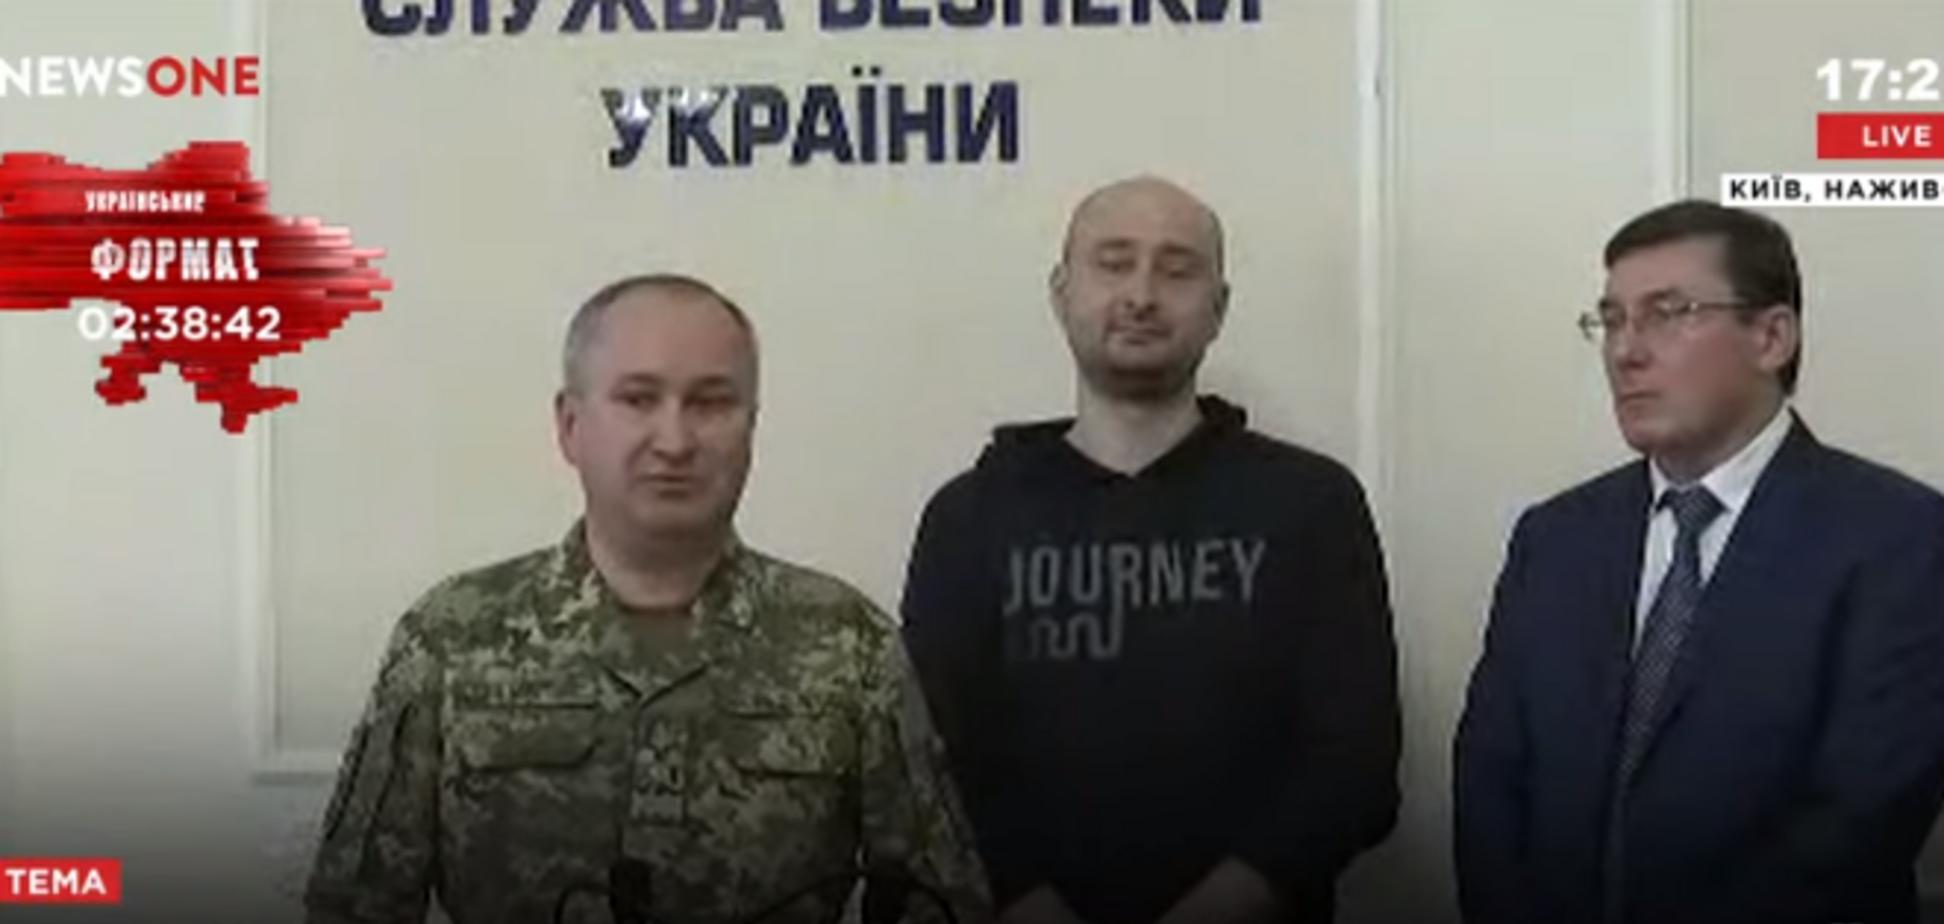 Екс-боєць АТО отримав $15 тис. за замах на Бабченка - СБУ